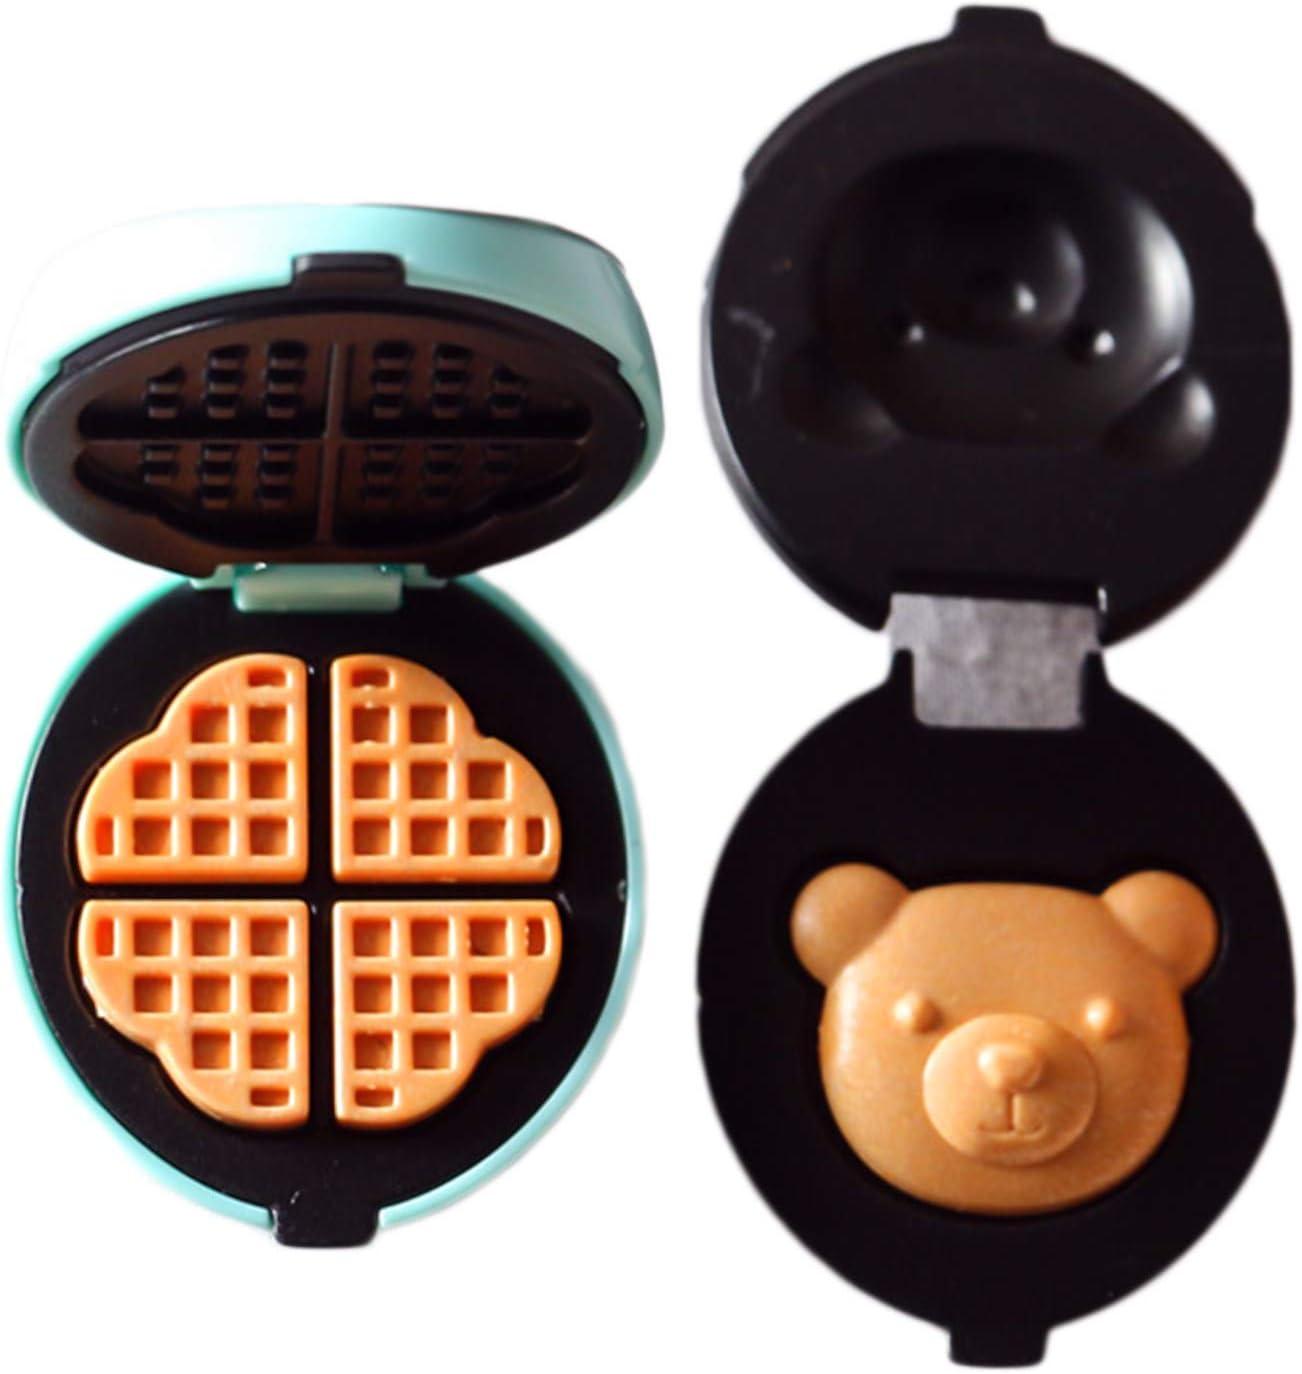 narutosak Doll House Accessories, Doll House Furnishings,7Pcs/Set Miniature Toaster Cute Realistic Plastic Mini Bread Waffle Machine Model for Entertainment - A